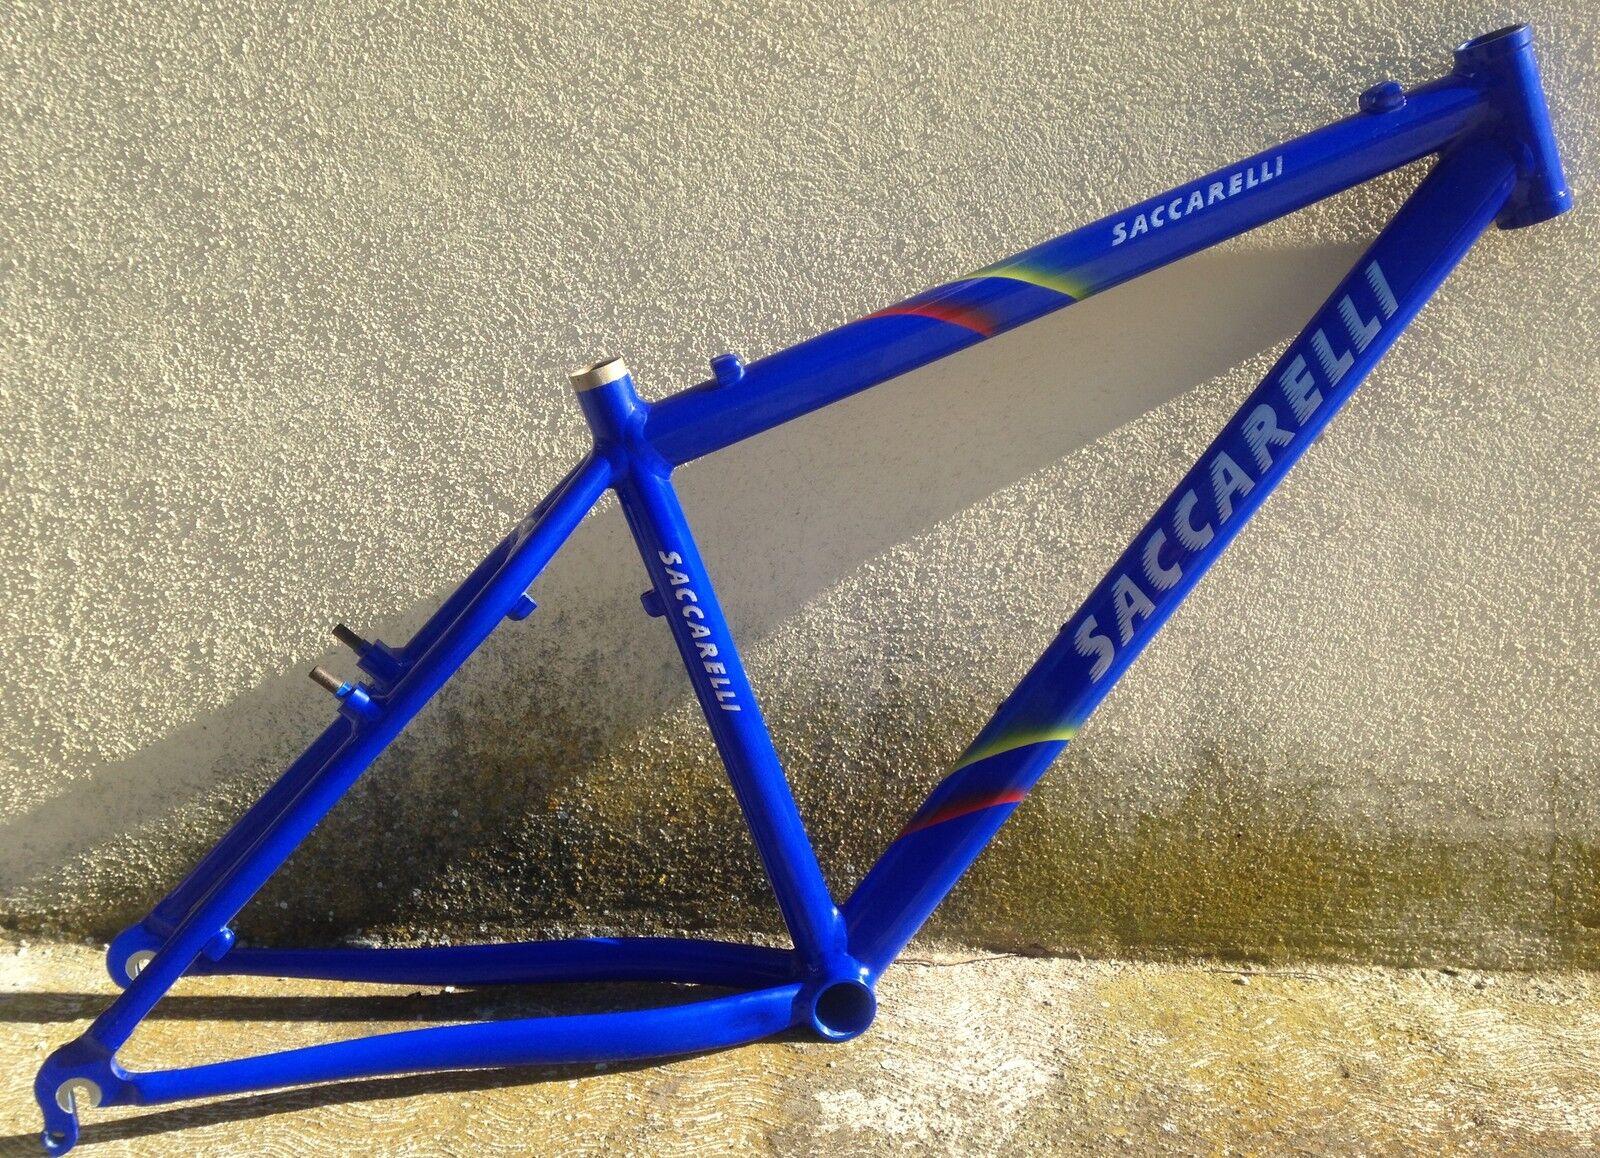 Telaio Bici alluminio Saccarelli Mountain Bike aluminium Frame 26 MTB MiI